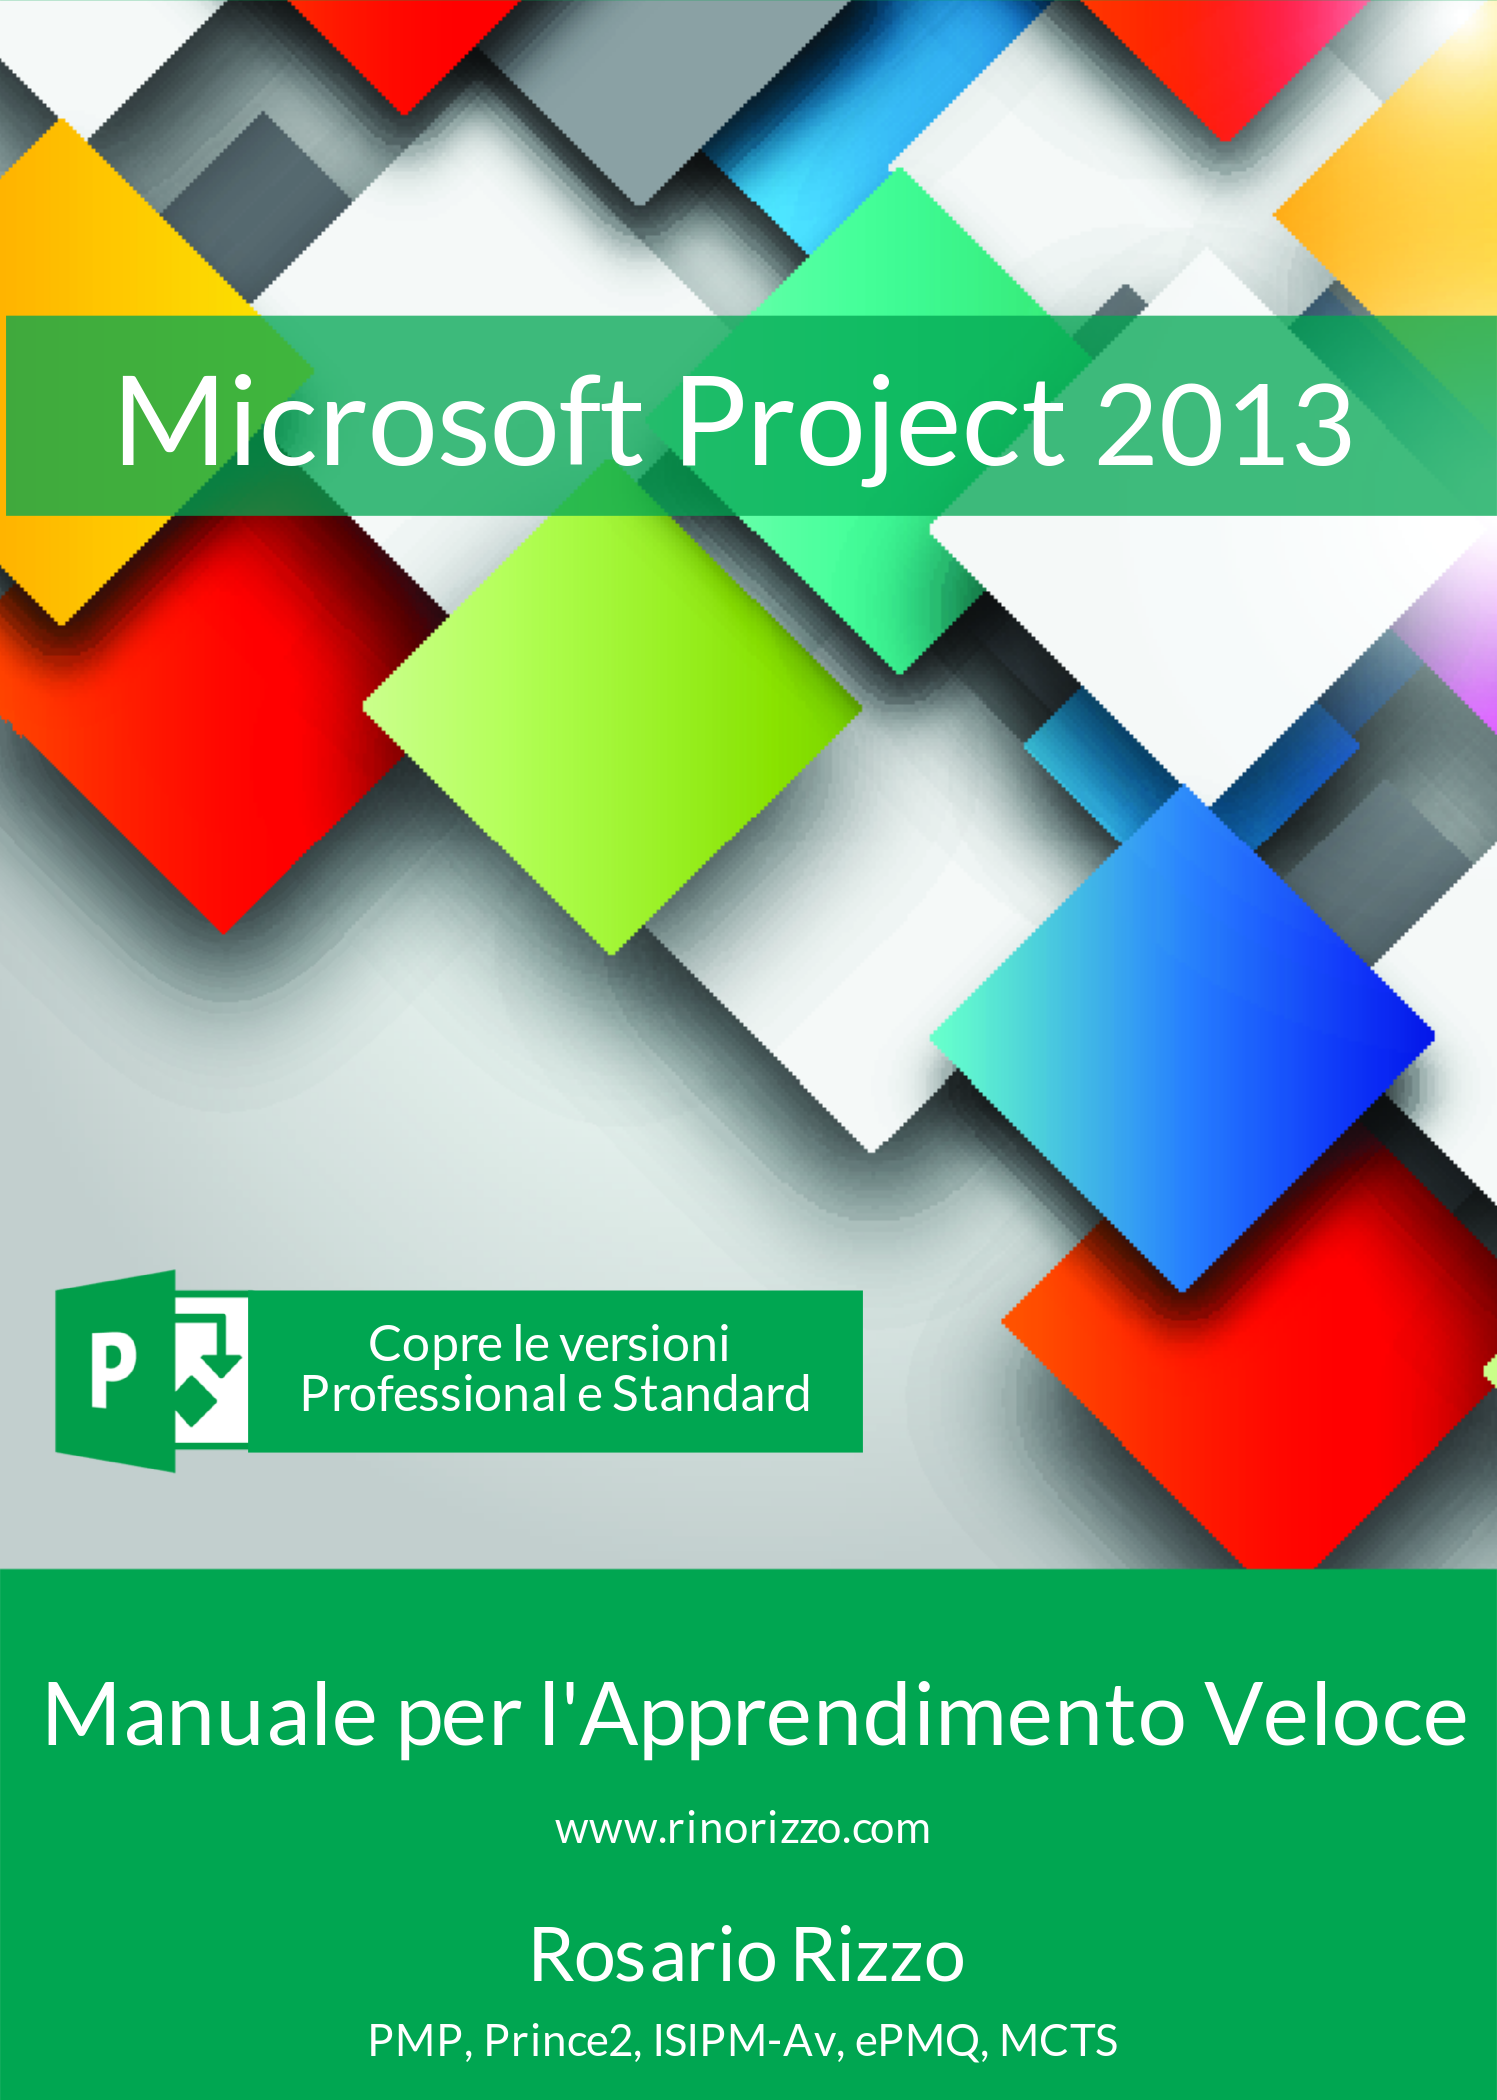 manuale Microsoft Project 2013